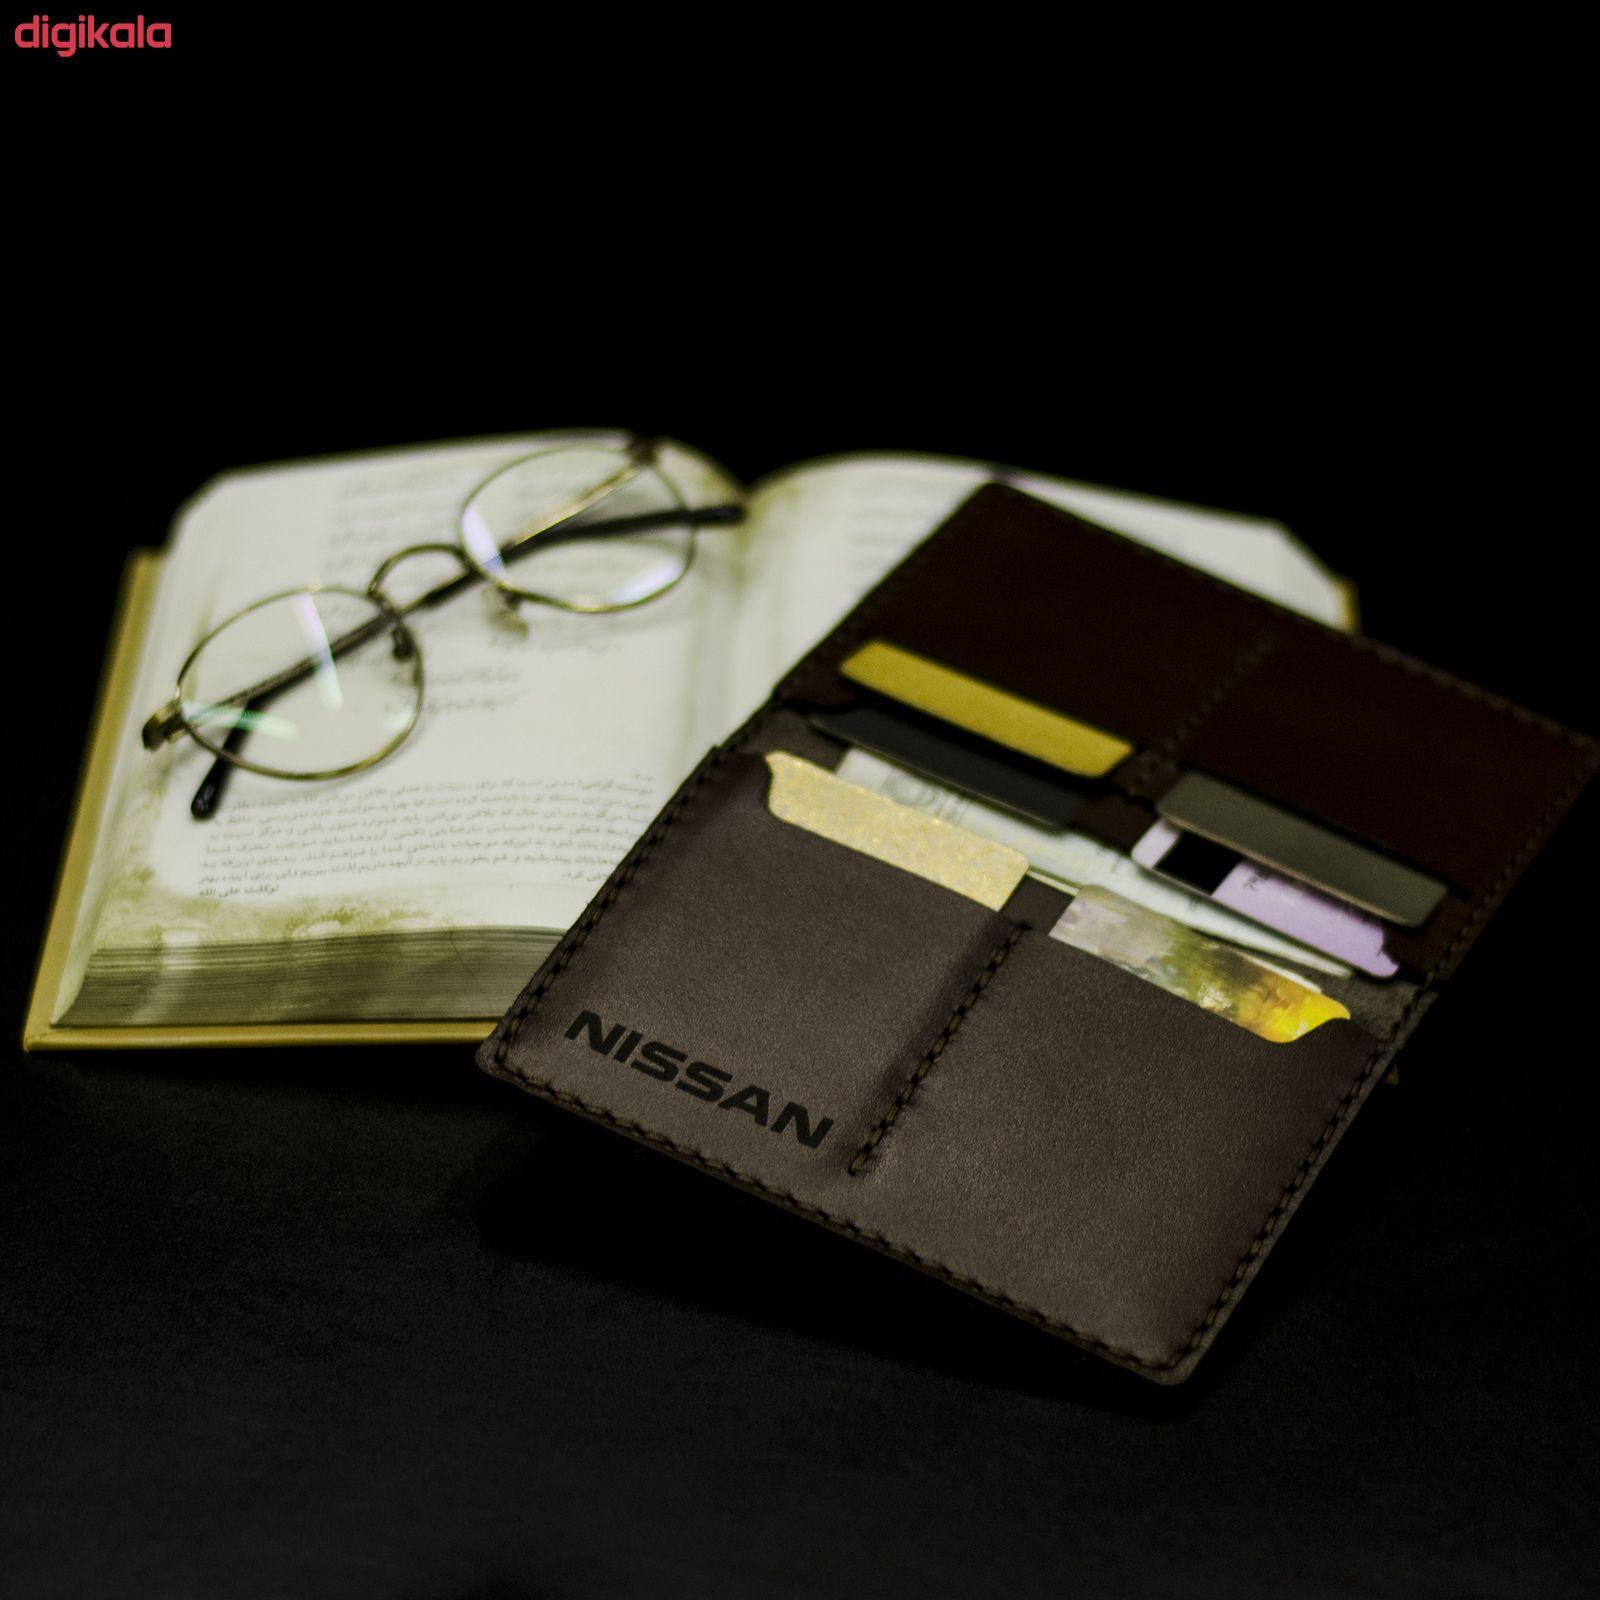 کیف مدارک مردانه چرمینه اسپرت طرح نیسان کد 43024-B main 1 5